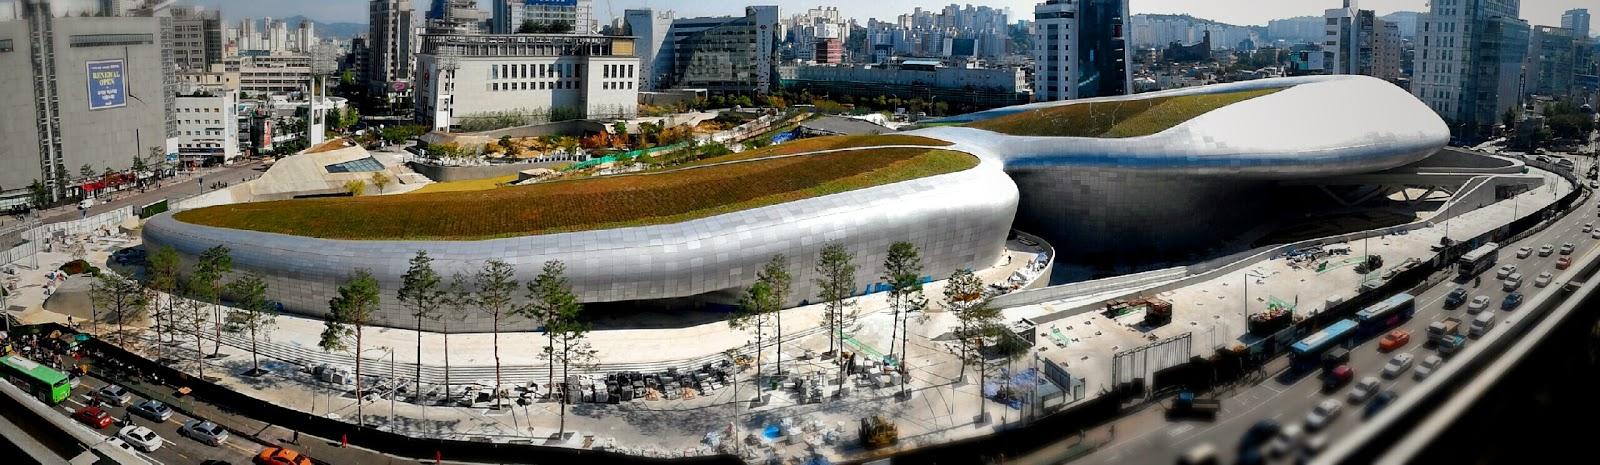 Bird's eye view of the  Dongdaemun Design plaza